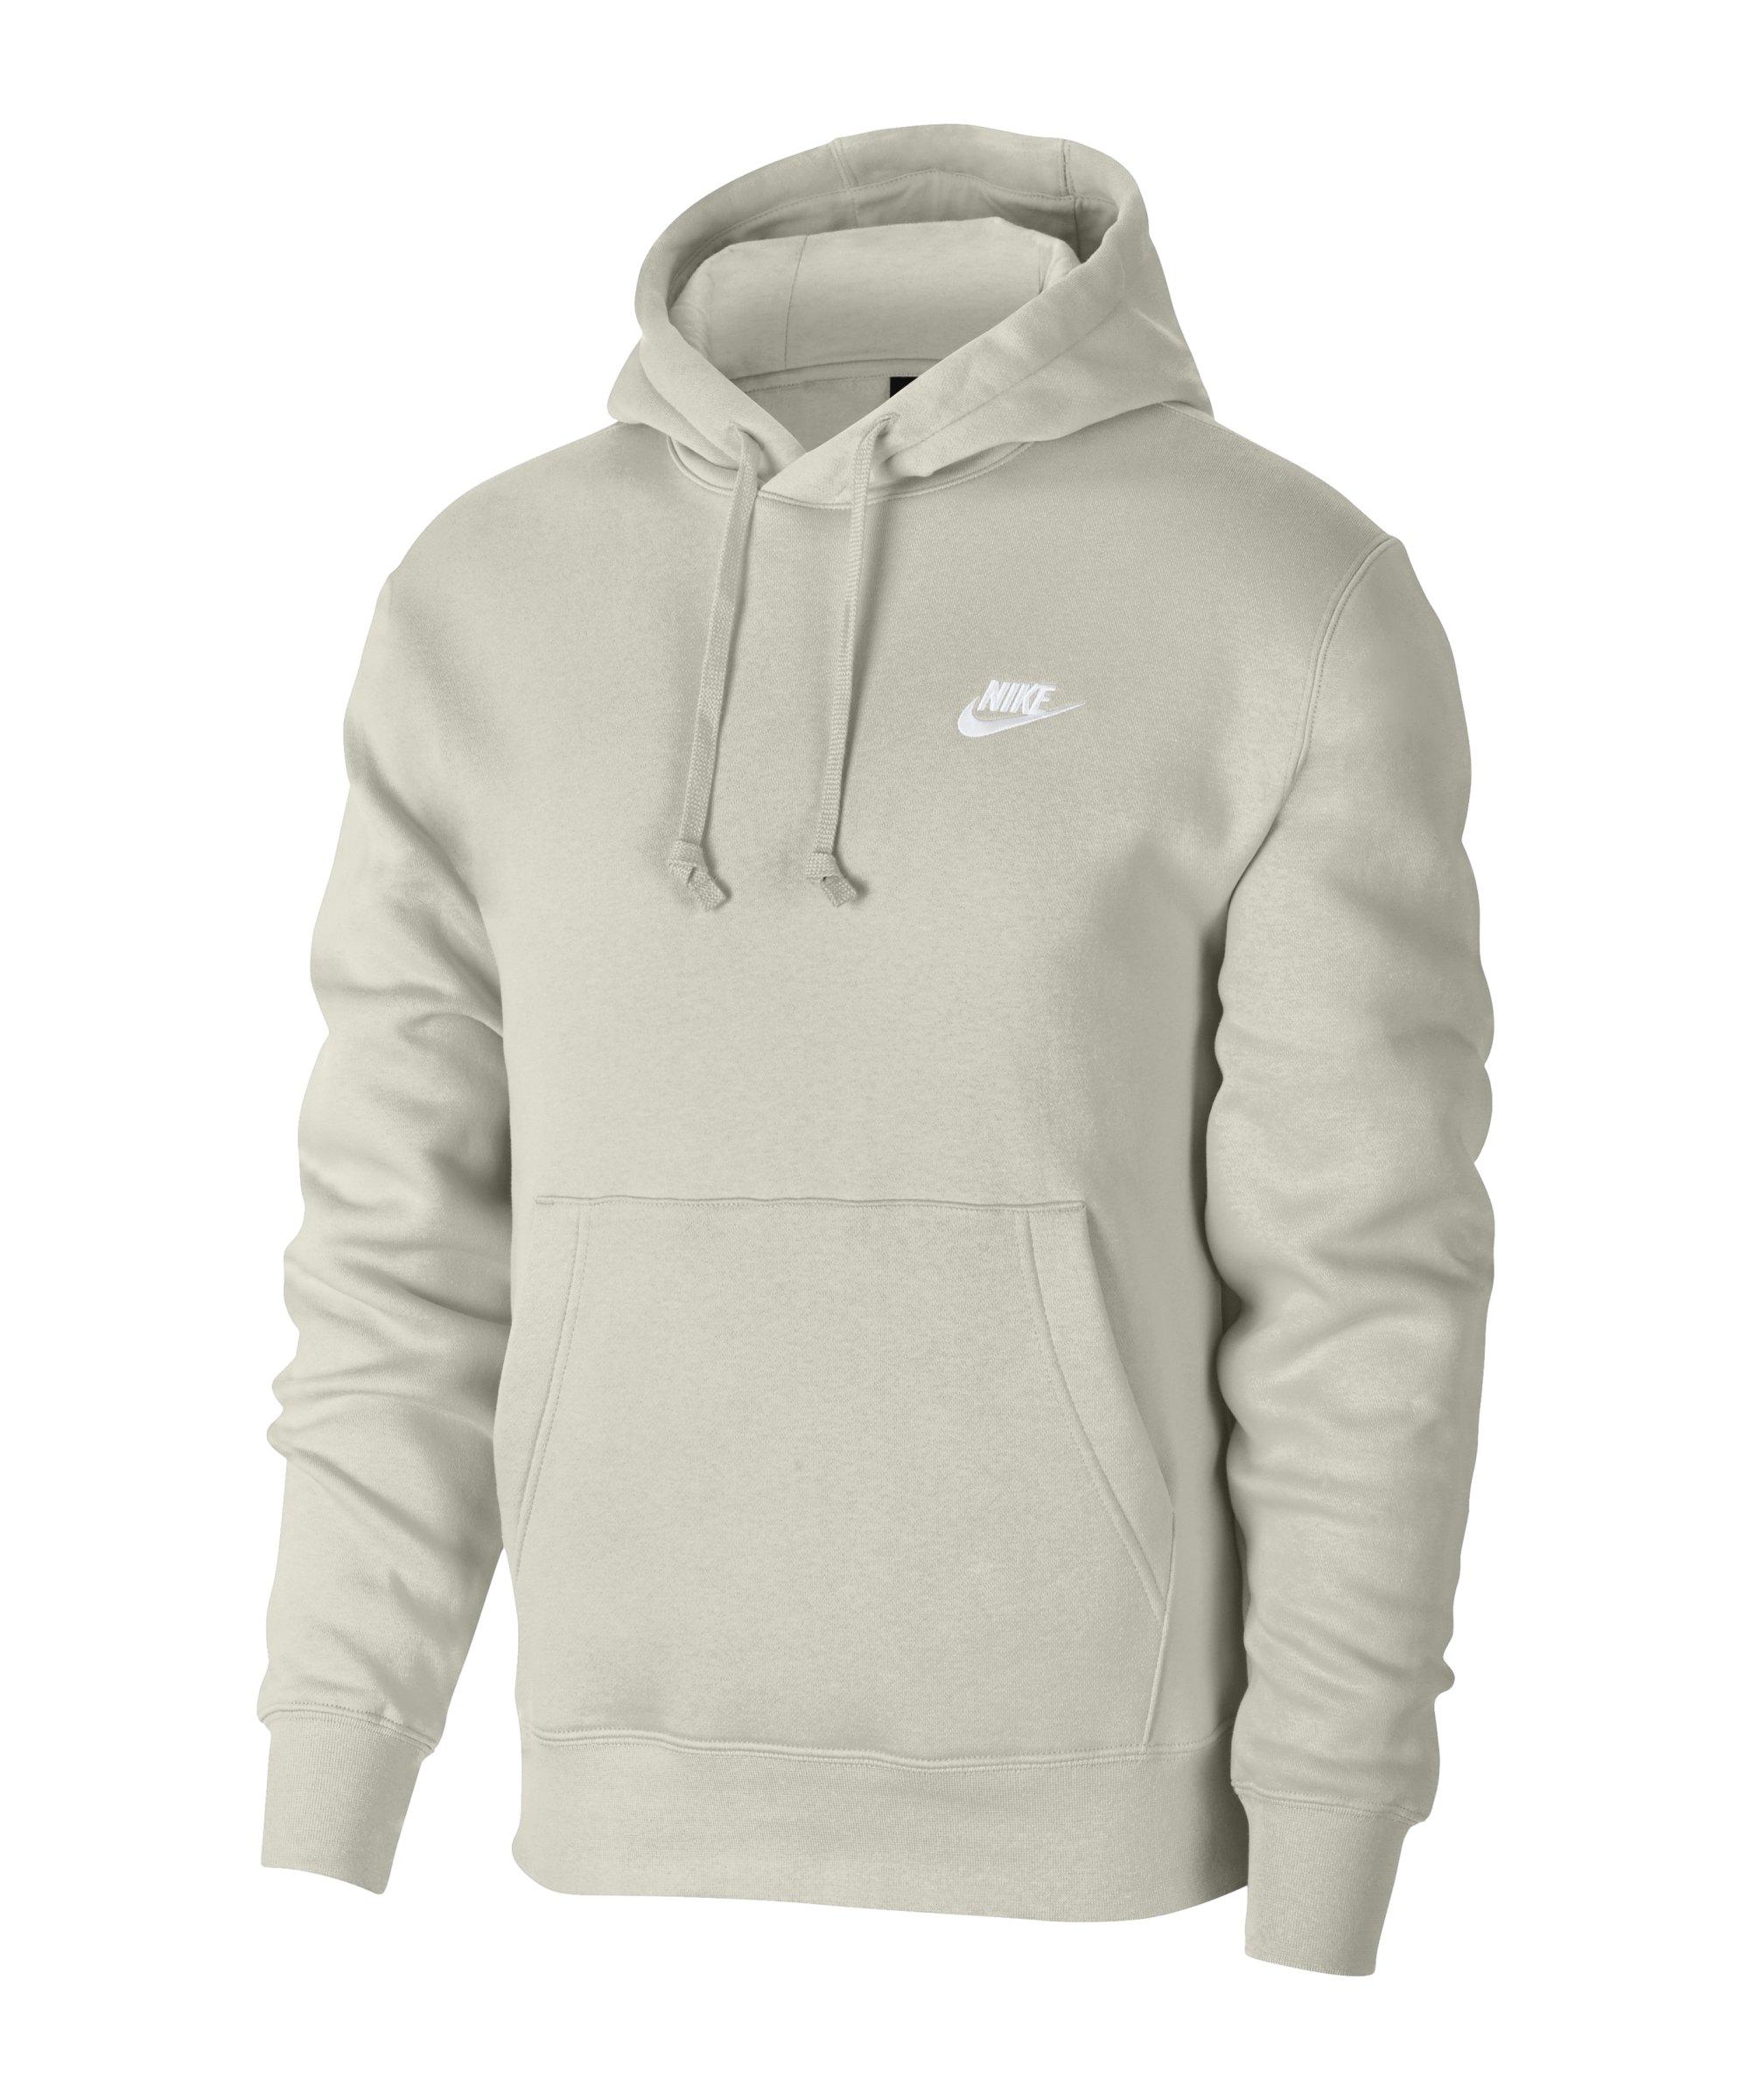 Nike Club Fleece Hoody Braun F072 - braun